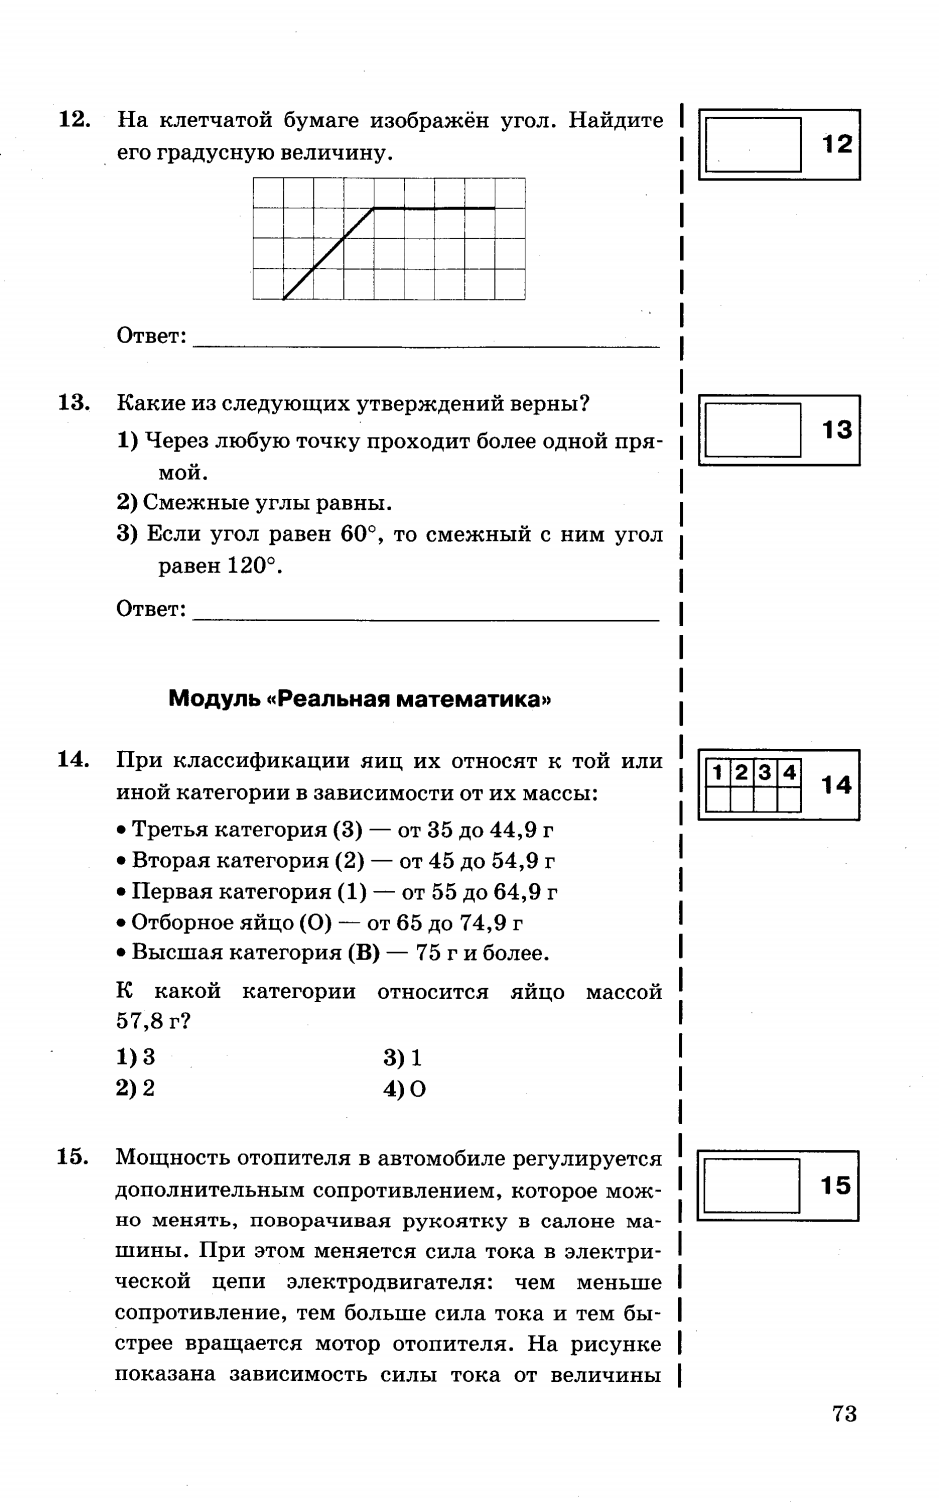 https://docs.google.com/viewer?pid=explorer&srcid=0Bw_f54pvrxEtbldKNGgyaFE3TDg&chrome=false&docid=e803bf4555b2fe7a8e01072ad16bc93b%7Cc9acad21277b9c8c76d1236b5bcea6e2&a=bi&pagenumber=74&w=939